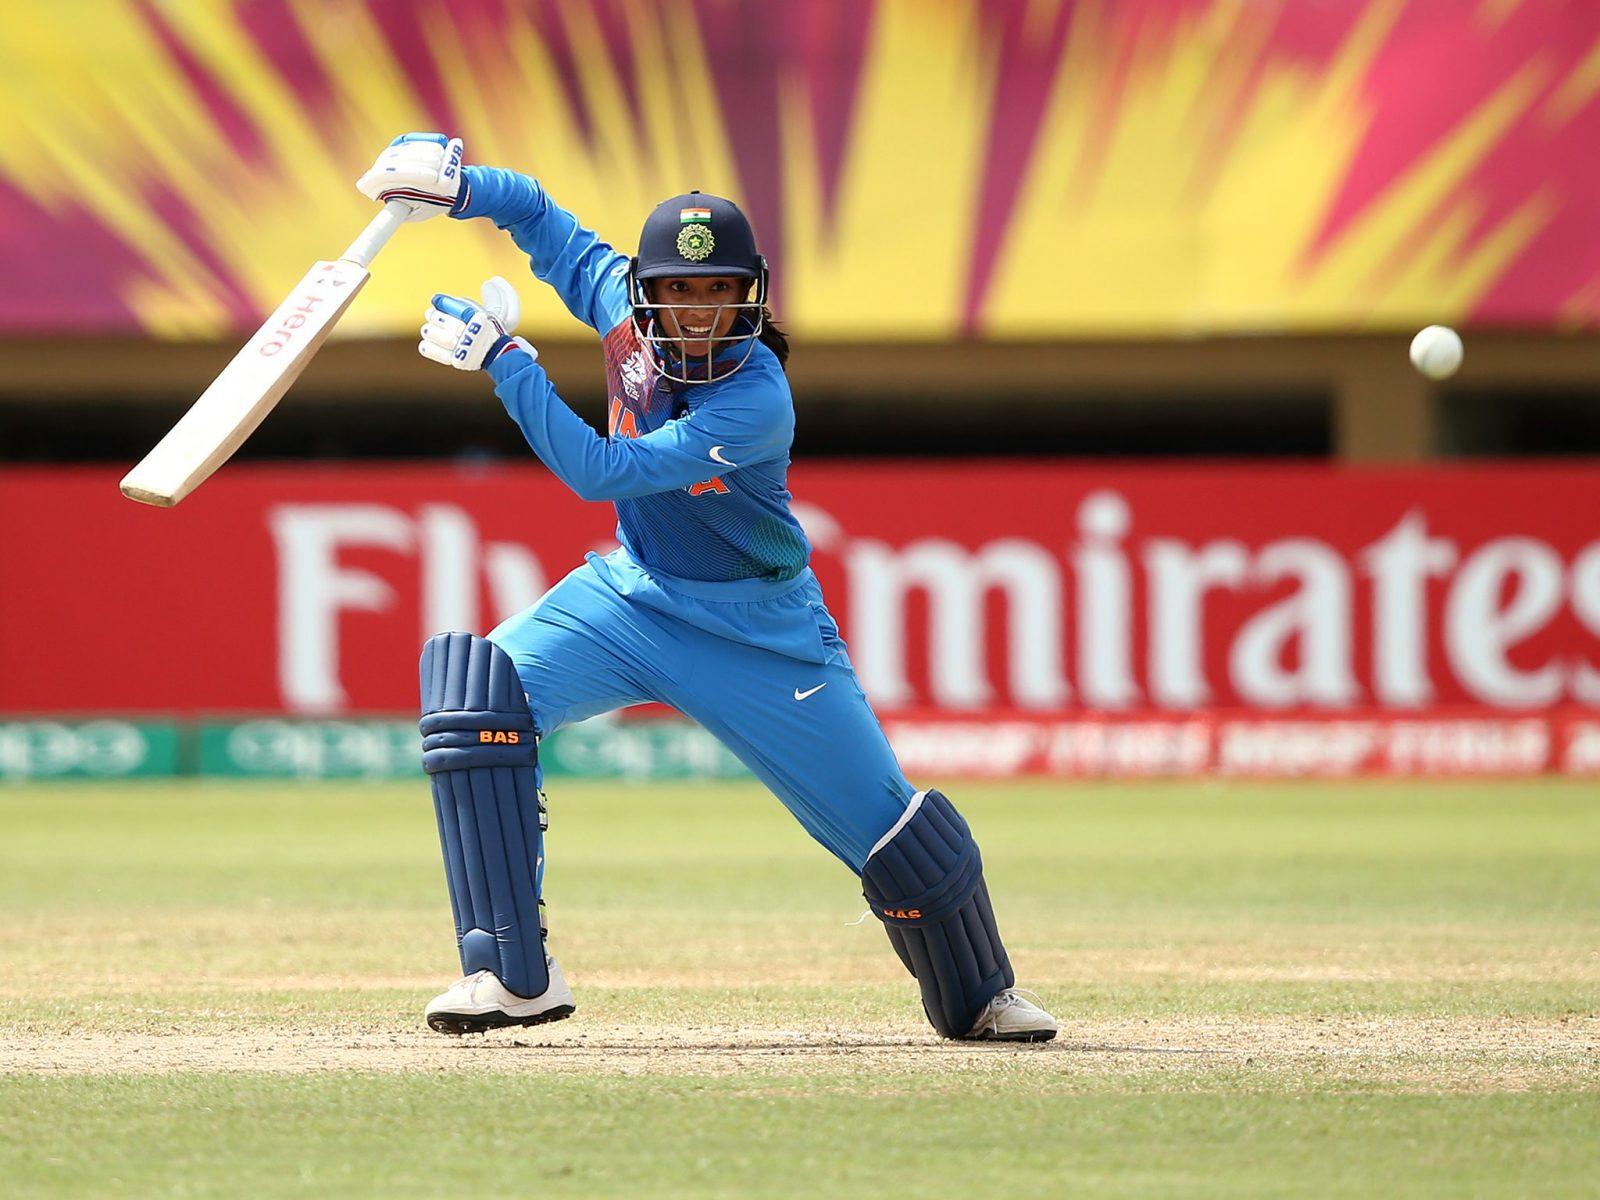 ICC Women's T20 World Cup - India v Qualifier 1, Perth, Western Australia